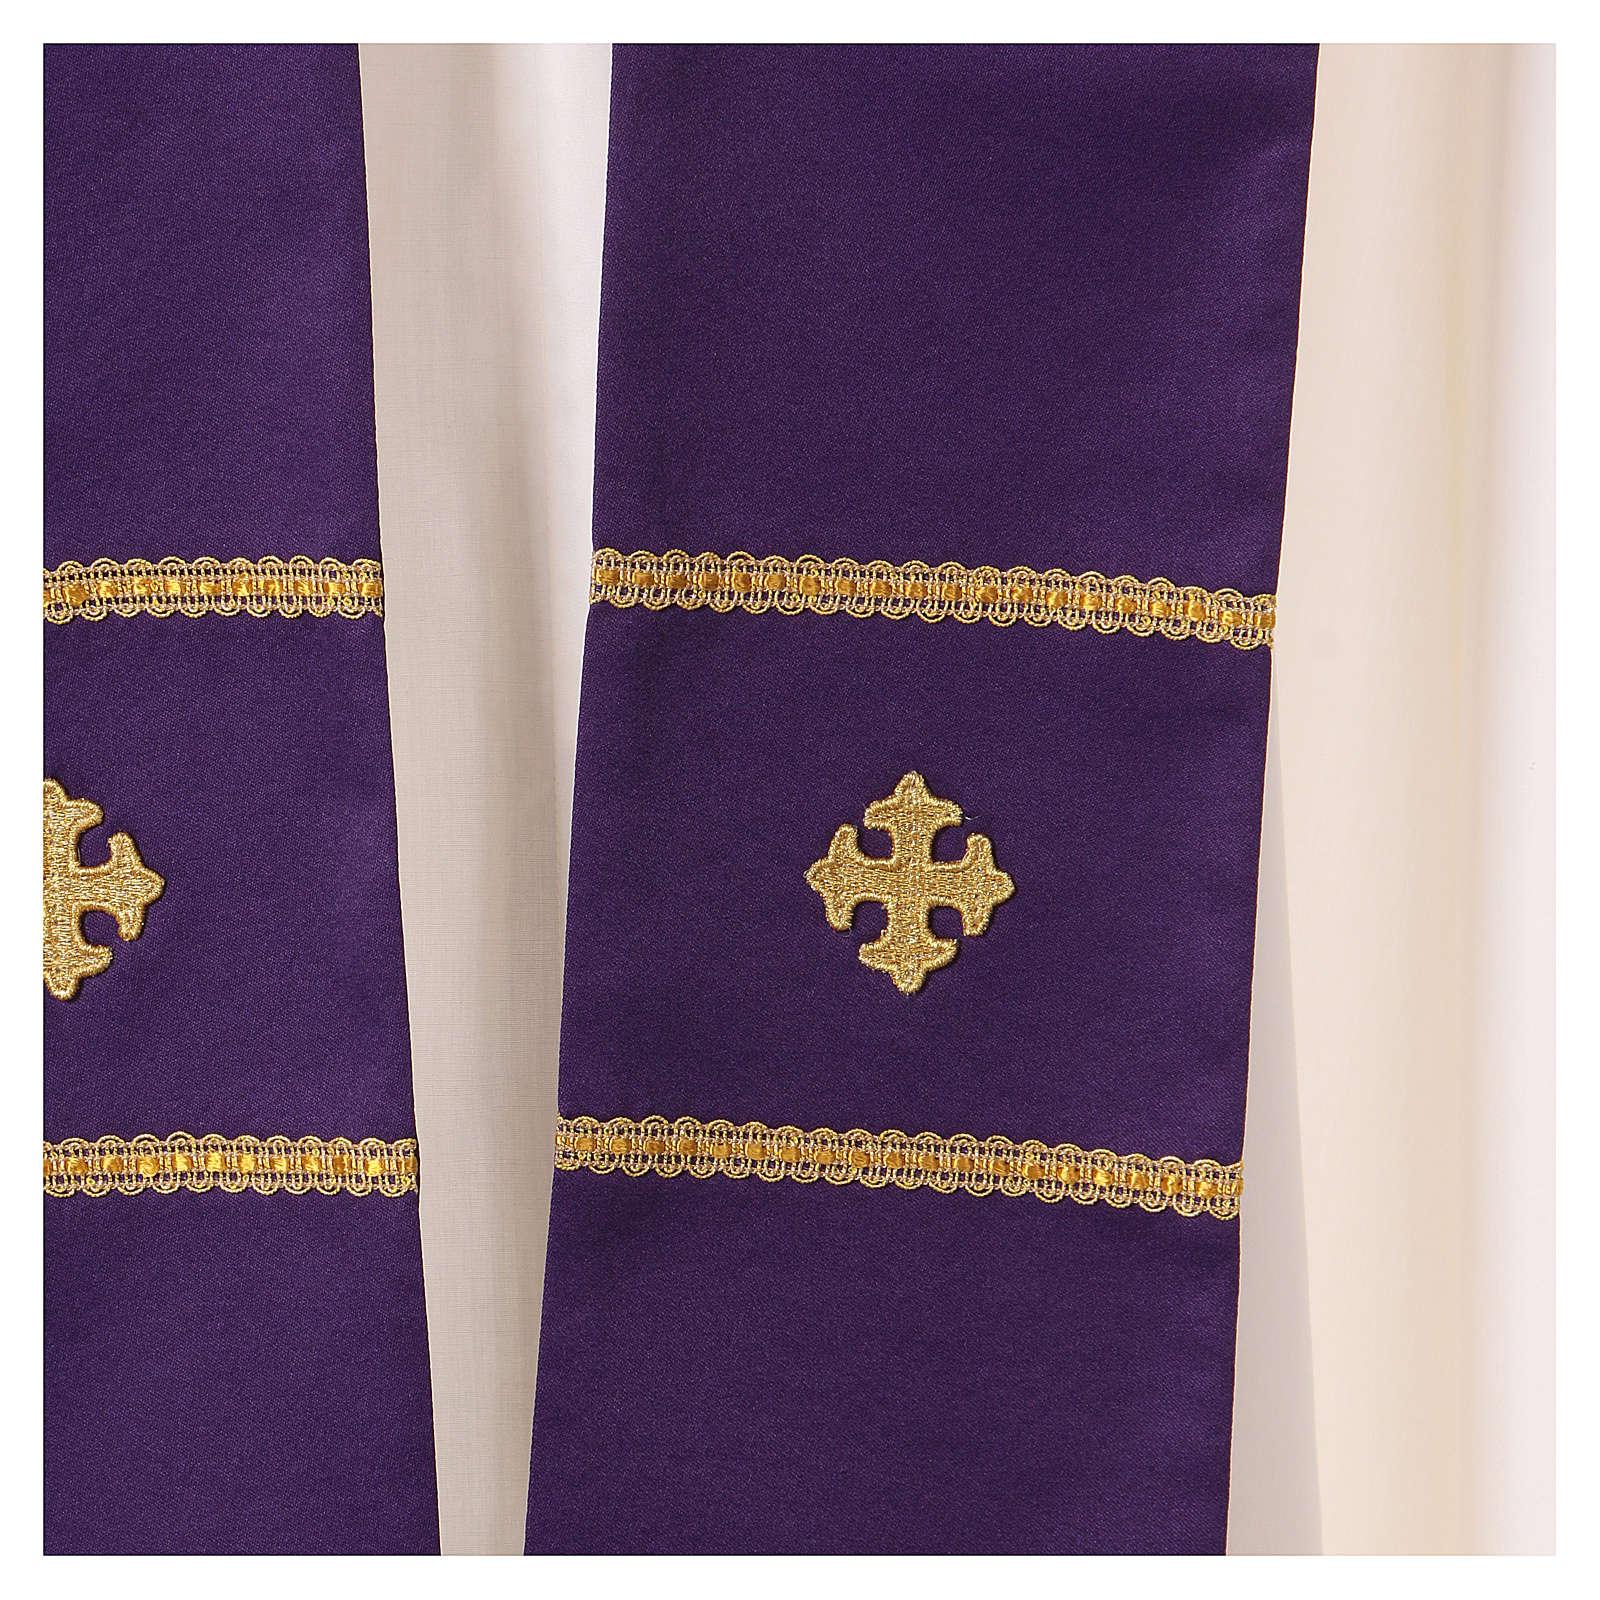 Casula decorazioni ricamate dorate 100% poliestere 4